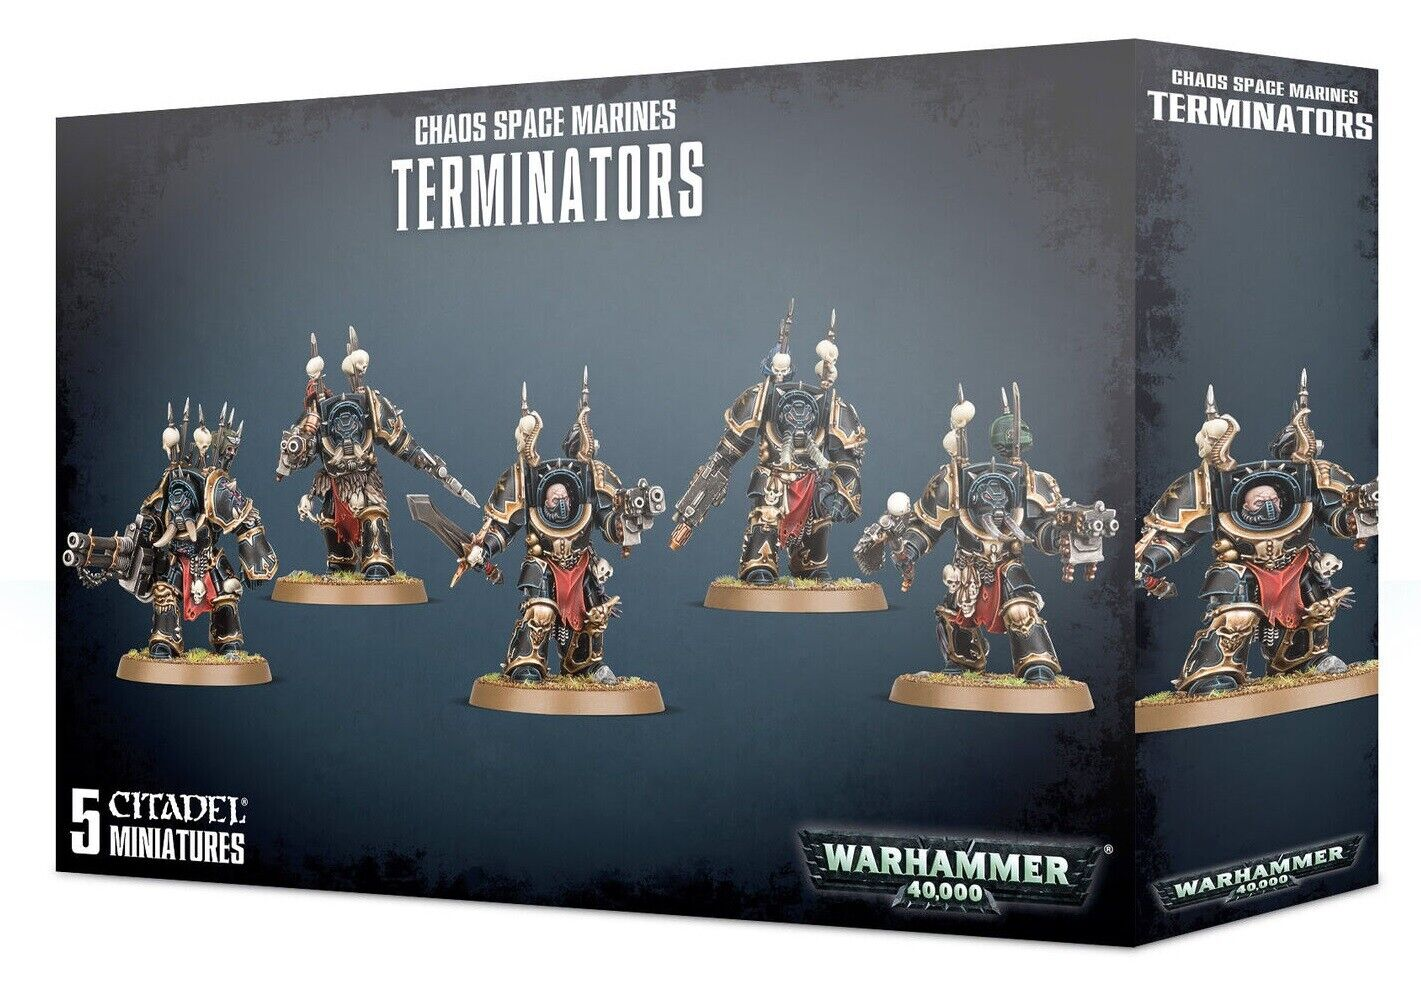 Warhammer 40k Chaos Space Marine Terminators New in Box